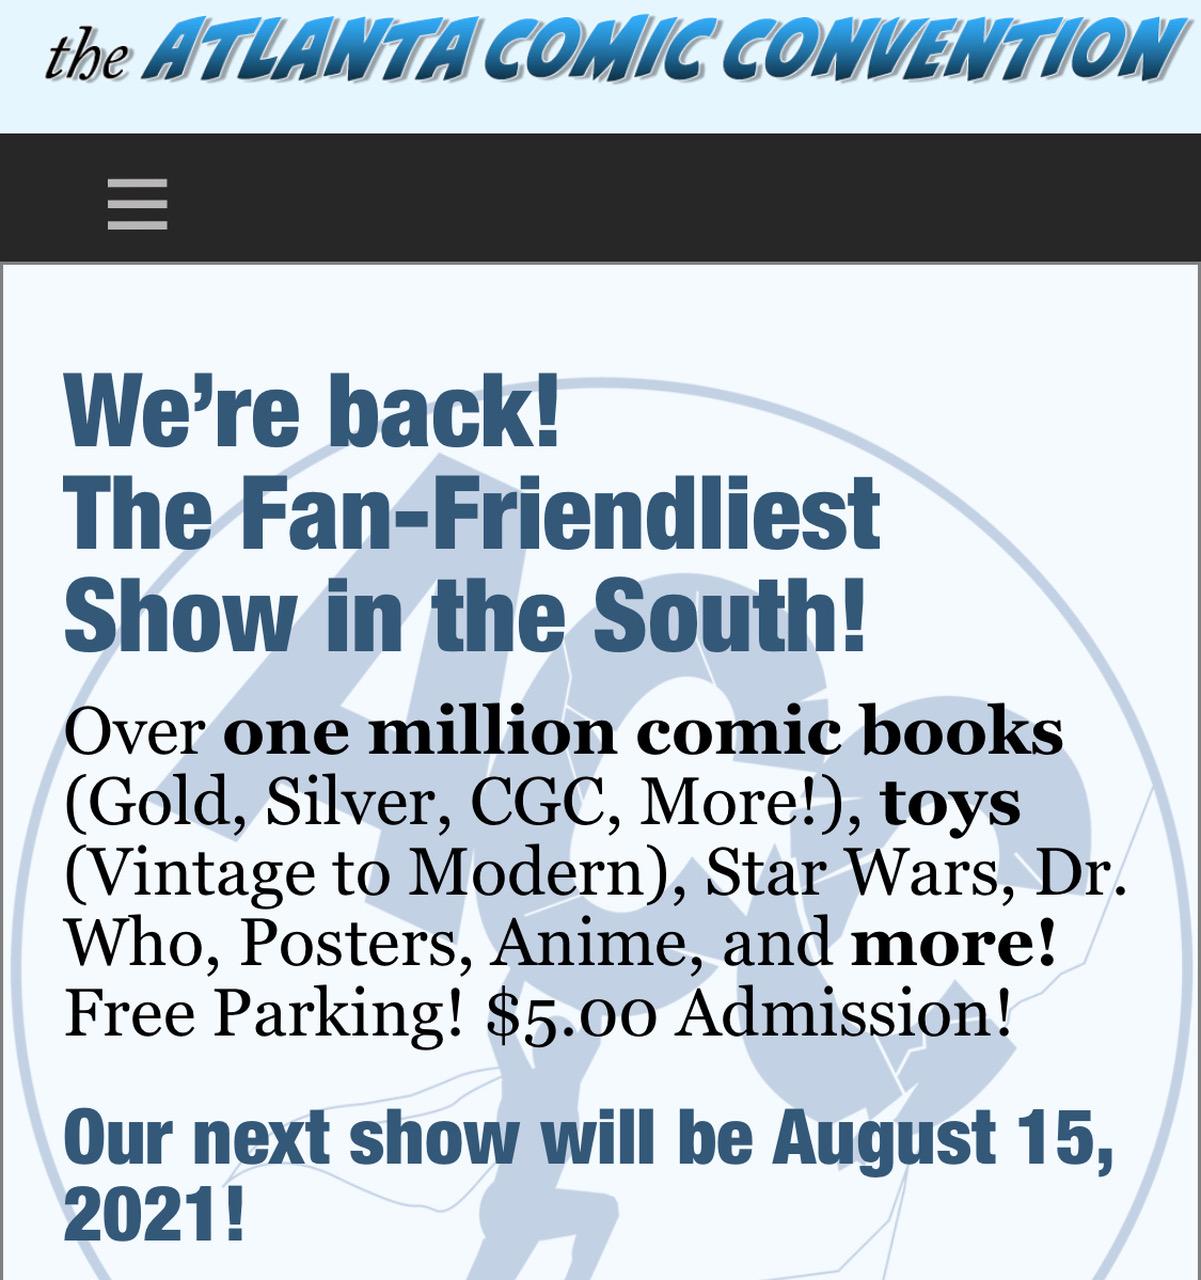 ComicConvention2021_02